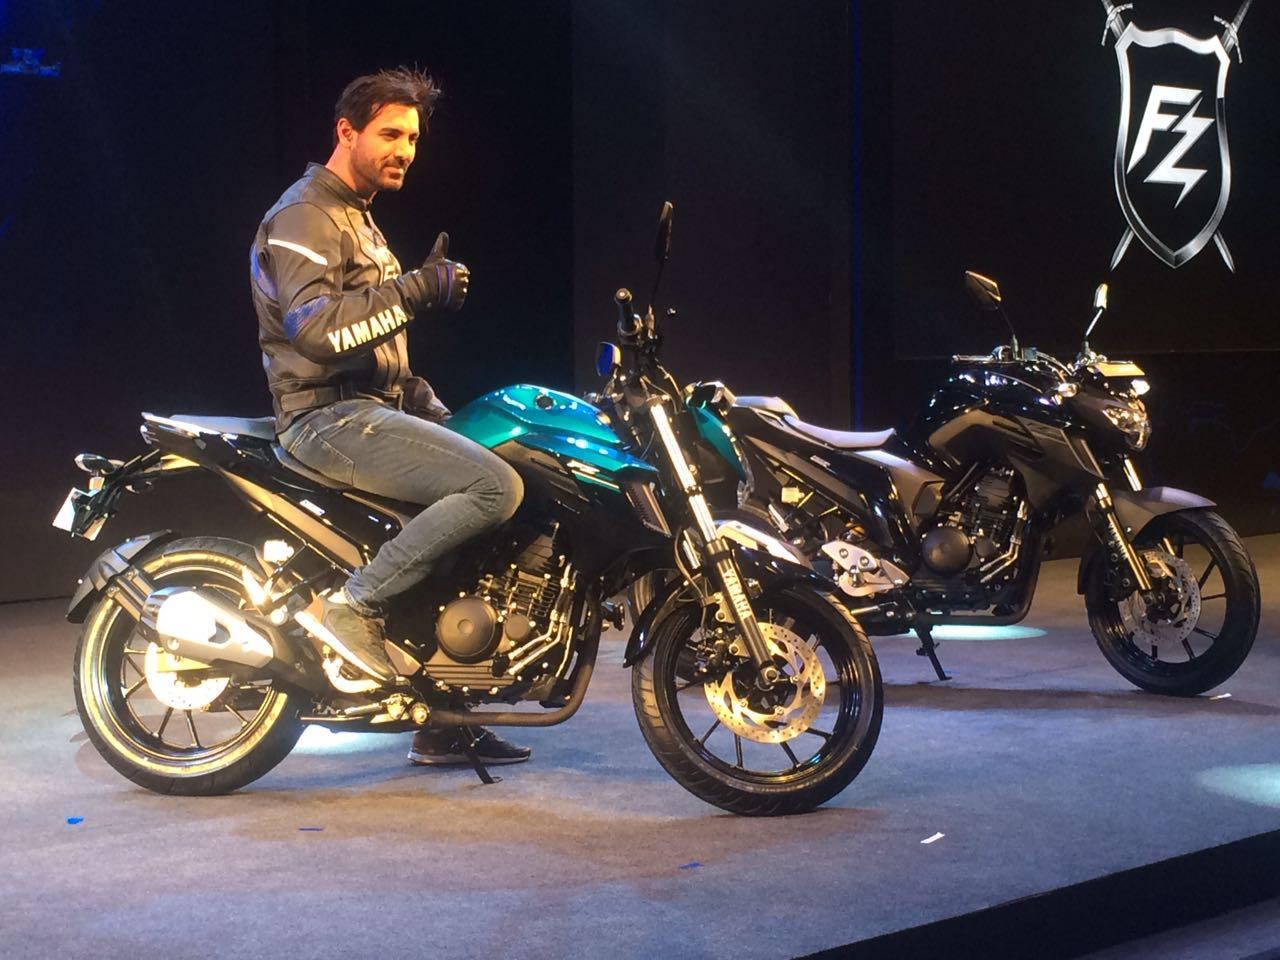 Yamaha-FZ150-India-launch-John-Abraham